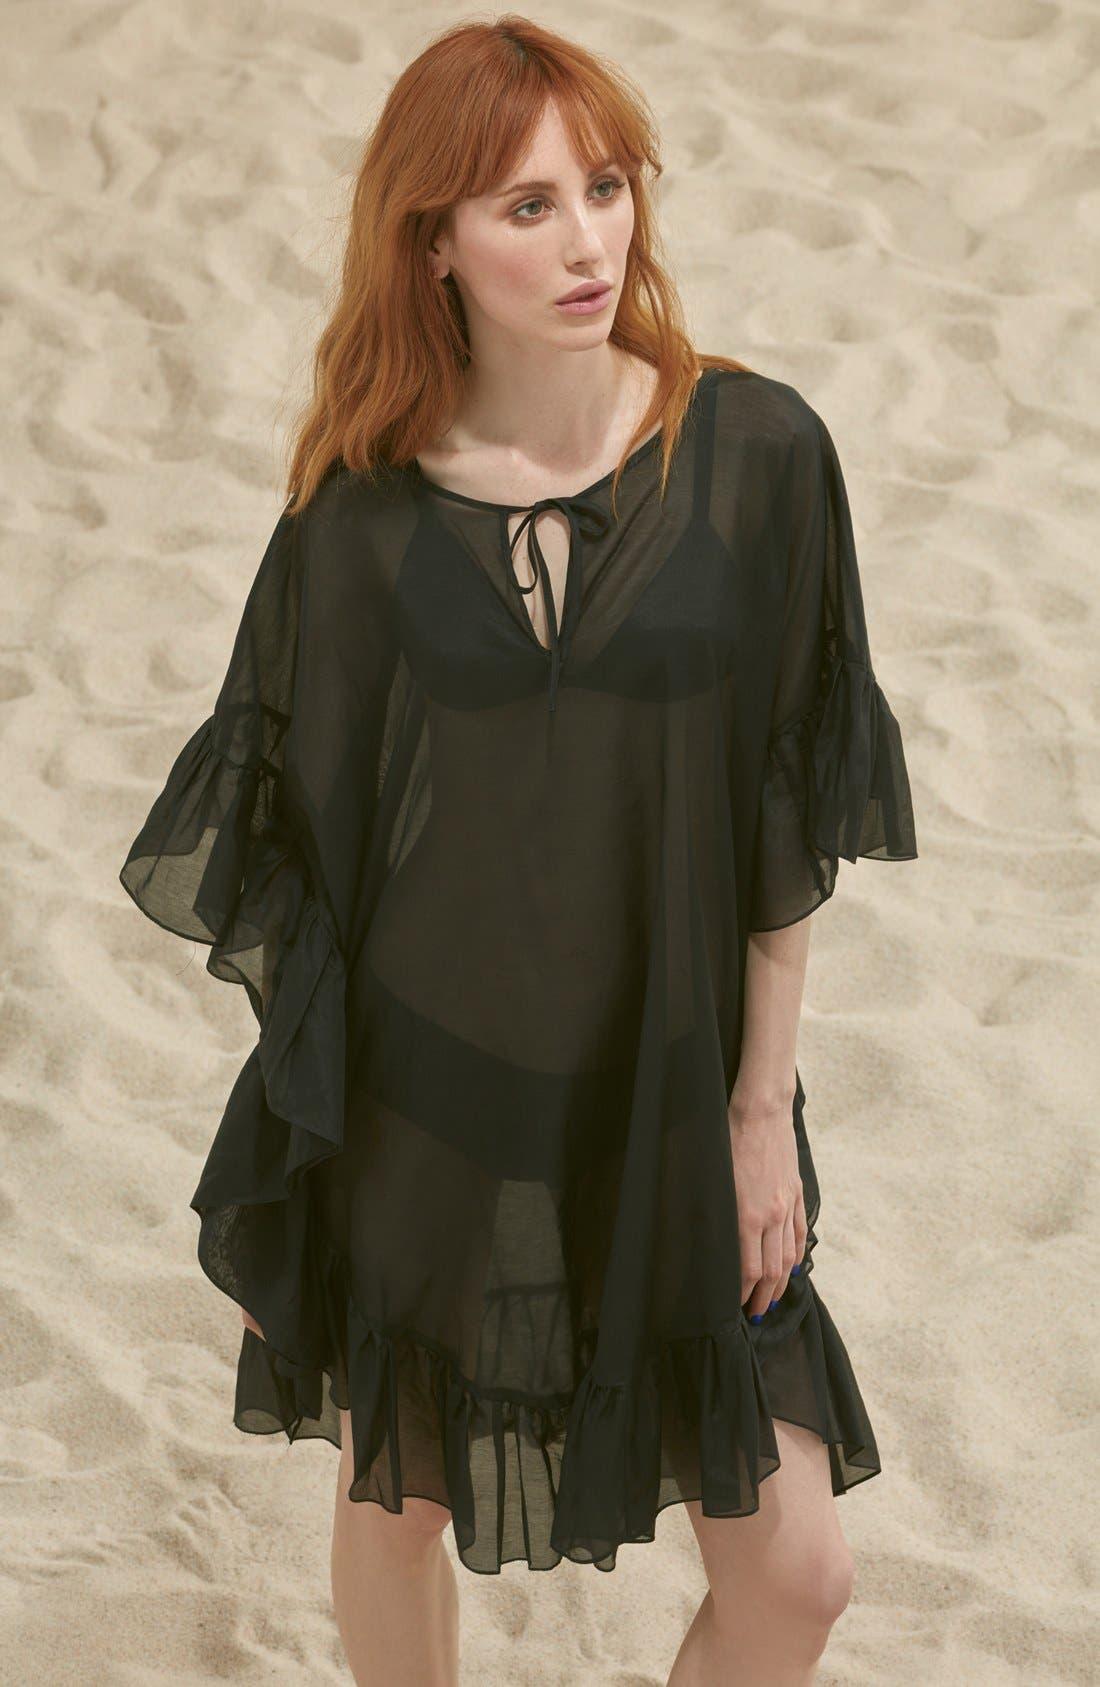 Main Image - Soler 'Yasmine' Frill Tie Cover-Up Caftan